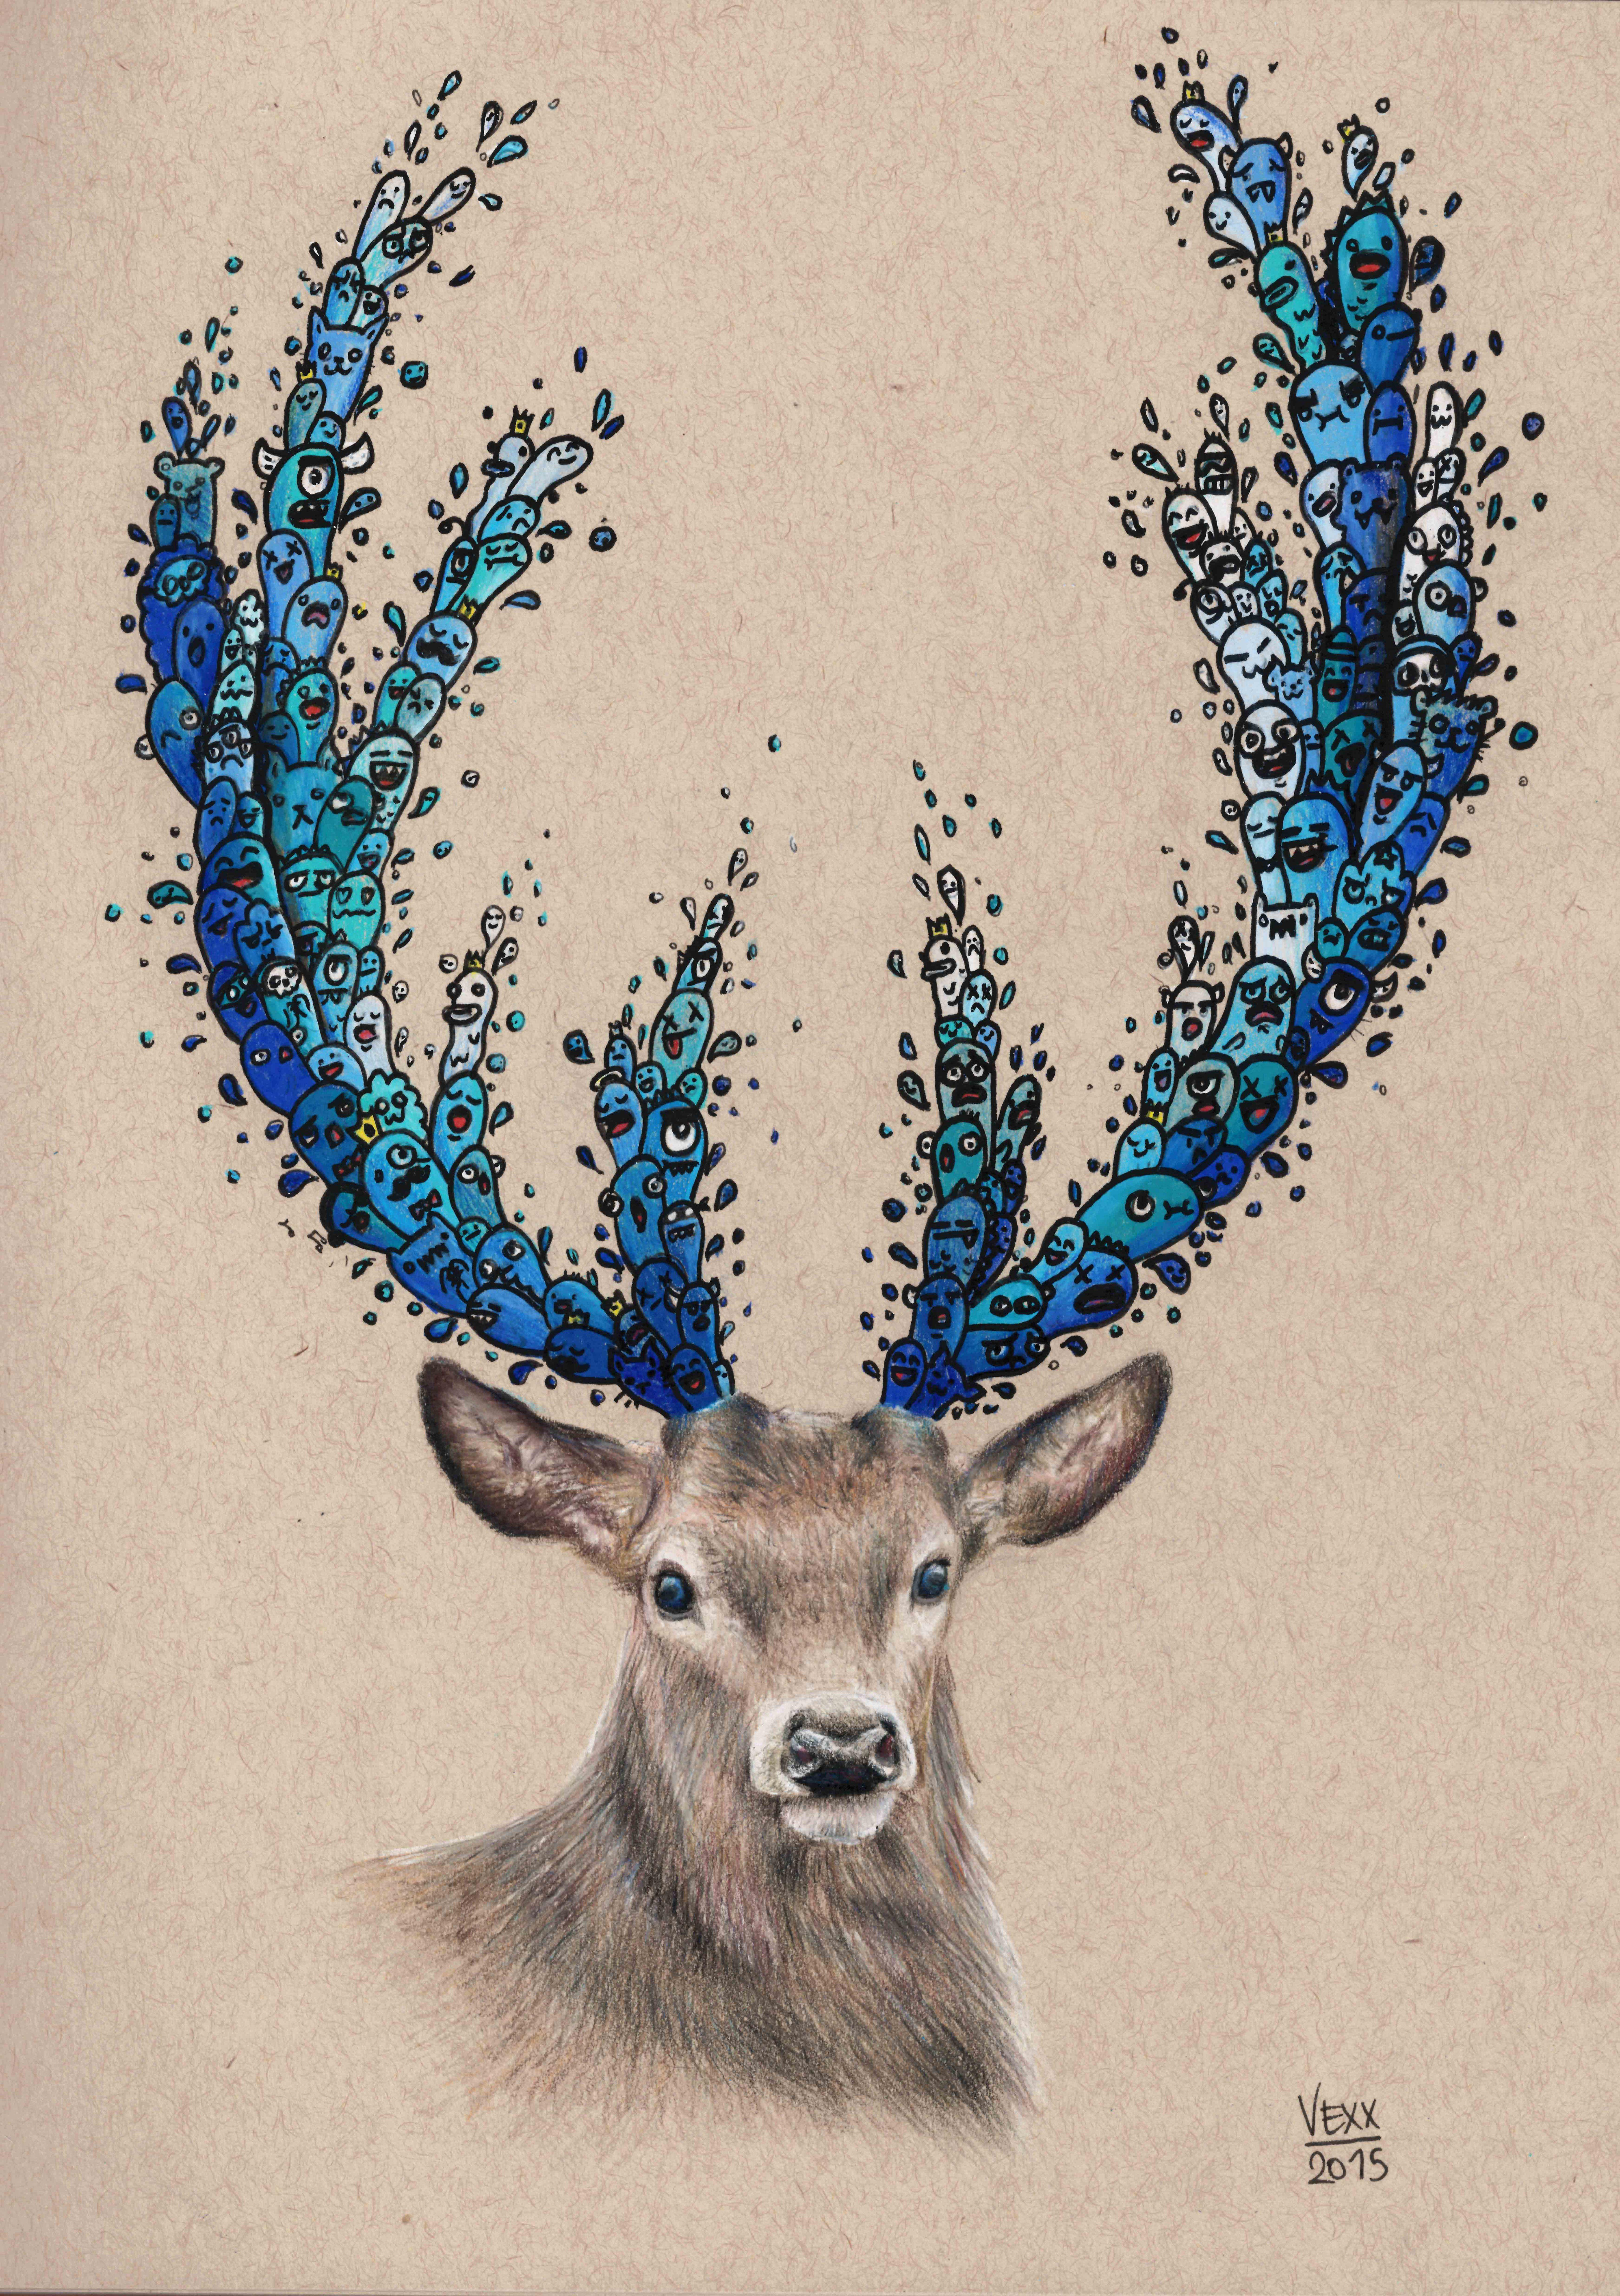 Majestic Deer Blue Doodles Print Vexx Art Draws. Doodle Sketches